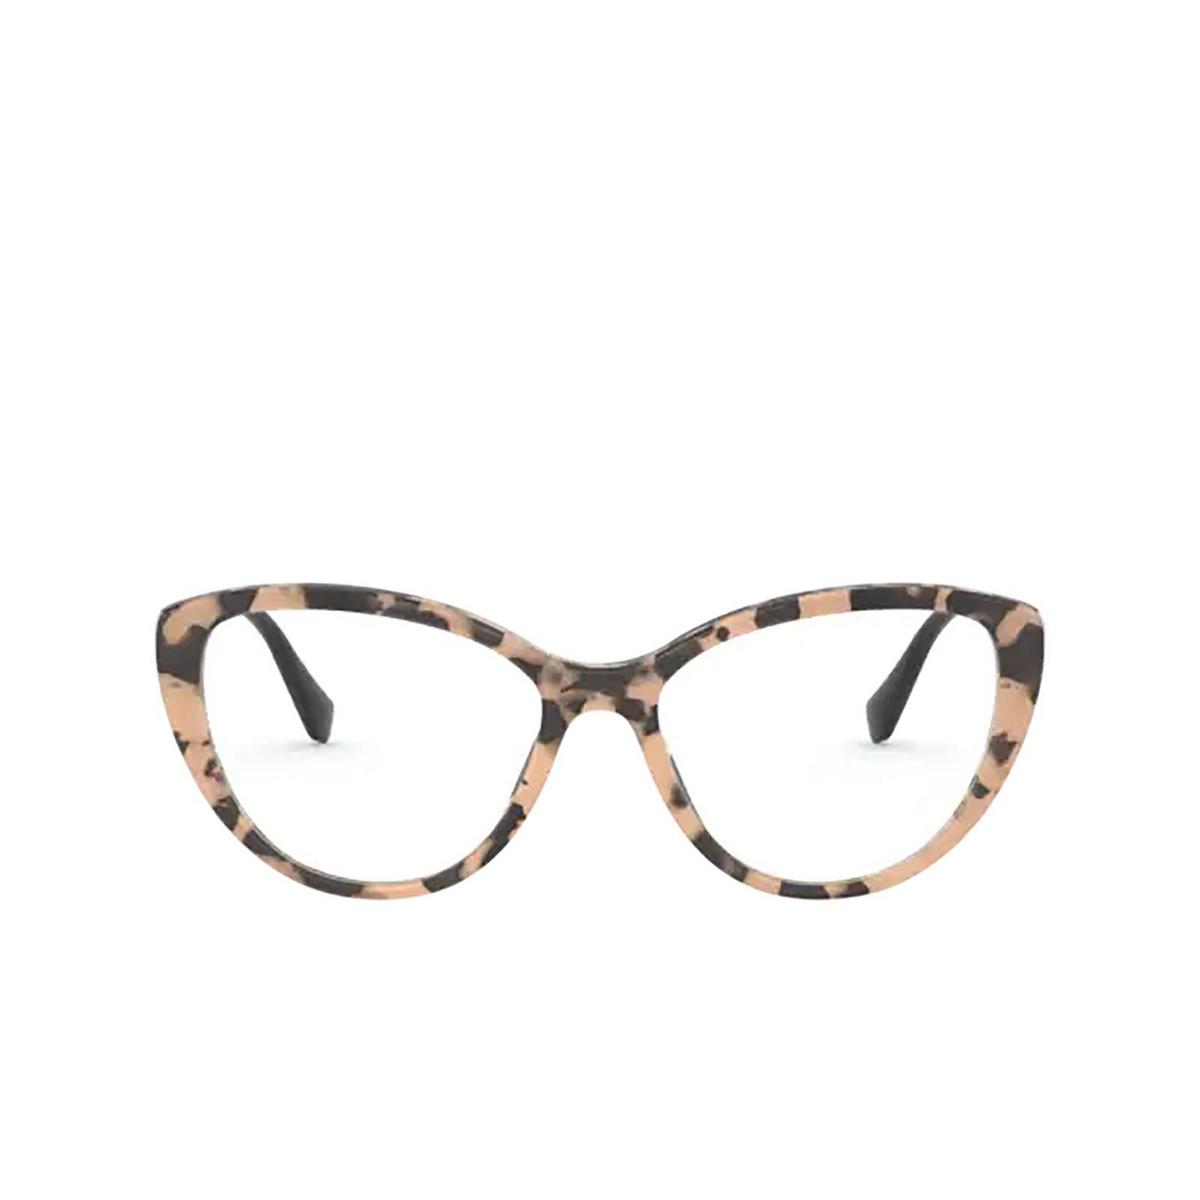 Miu Miu® Cat-eye Eyeglasses: MU 02SV color Havana 07D1O1 - front view.